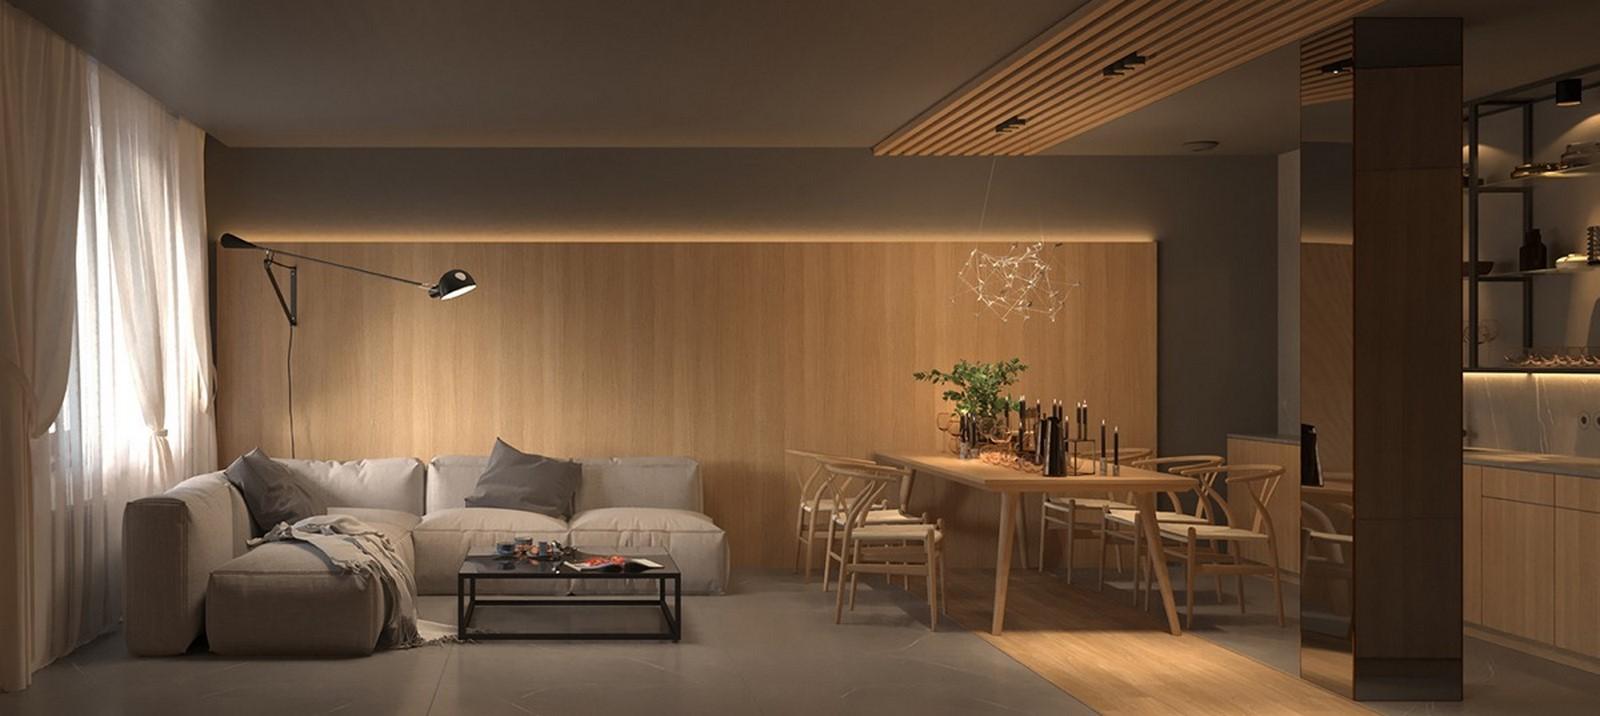 10 beginner level courses in interior design - Sheet8